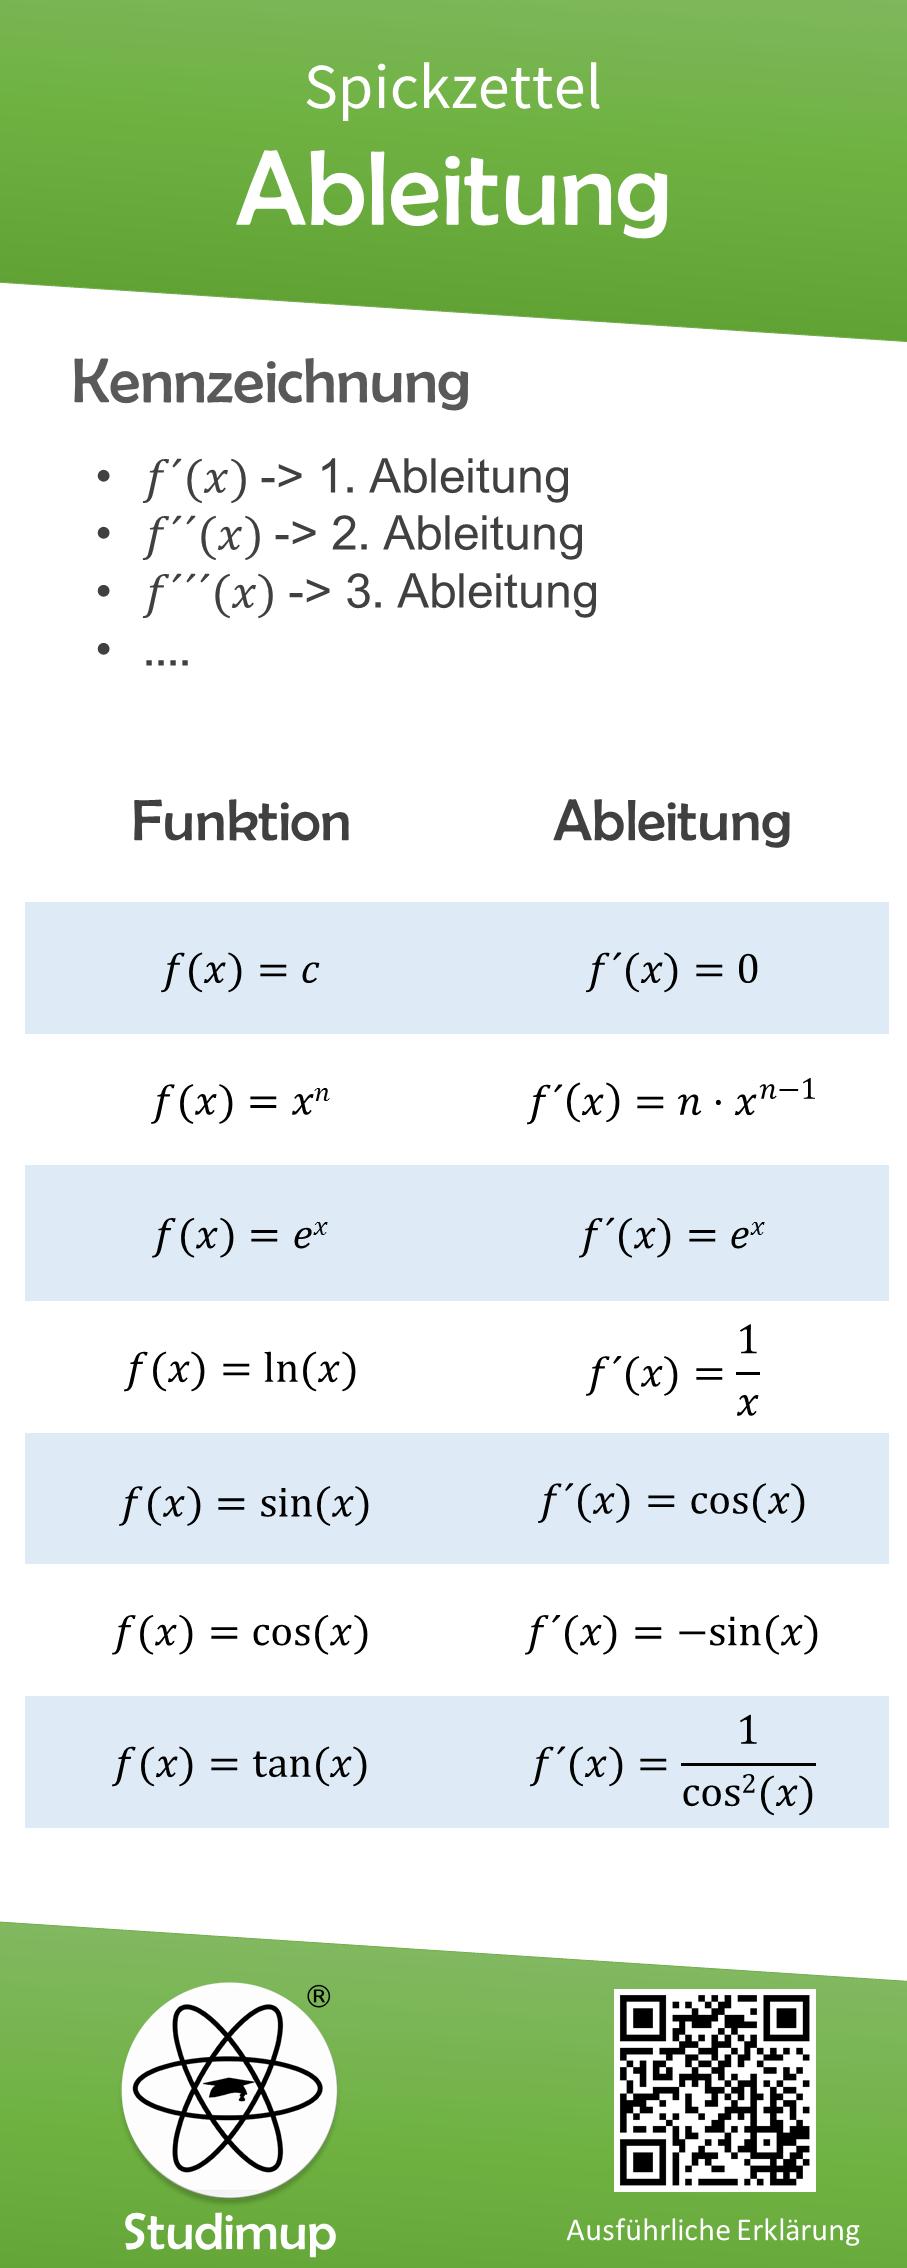 Ableitung Mathe Spickzettel Nachhilfe Mathe Spickzettel Mathe